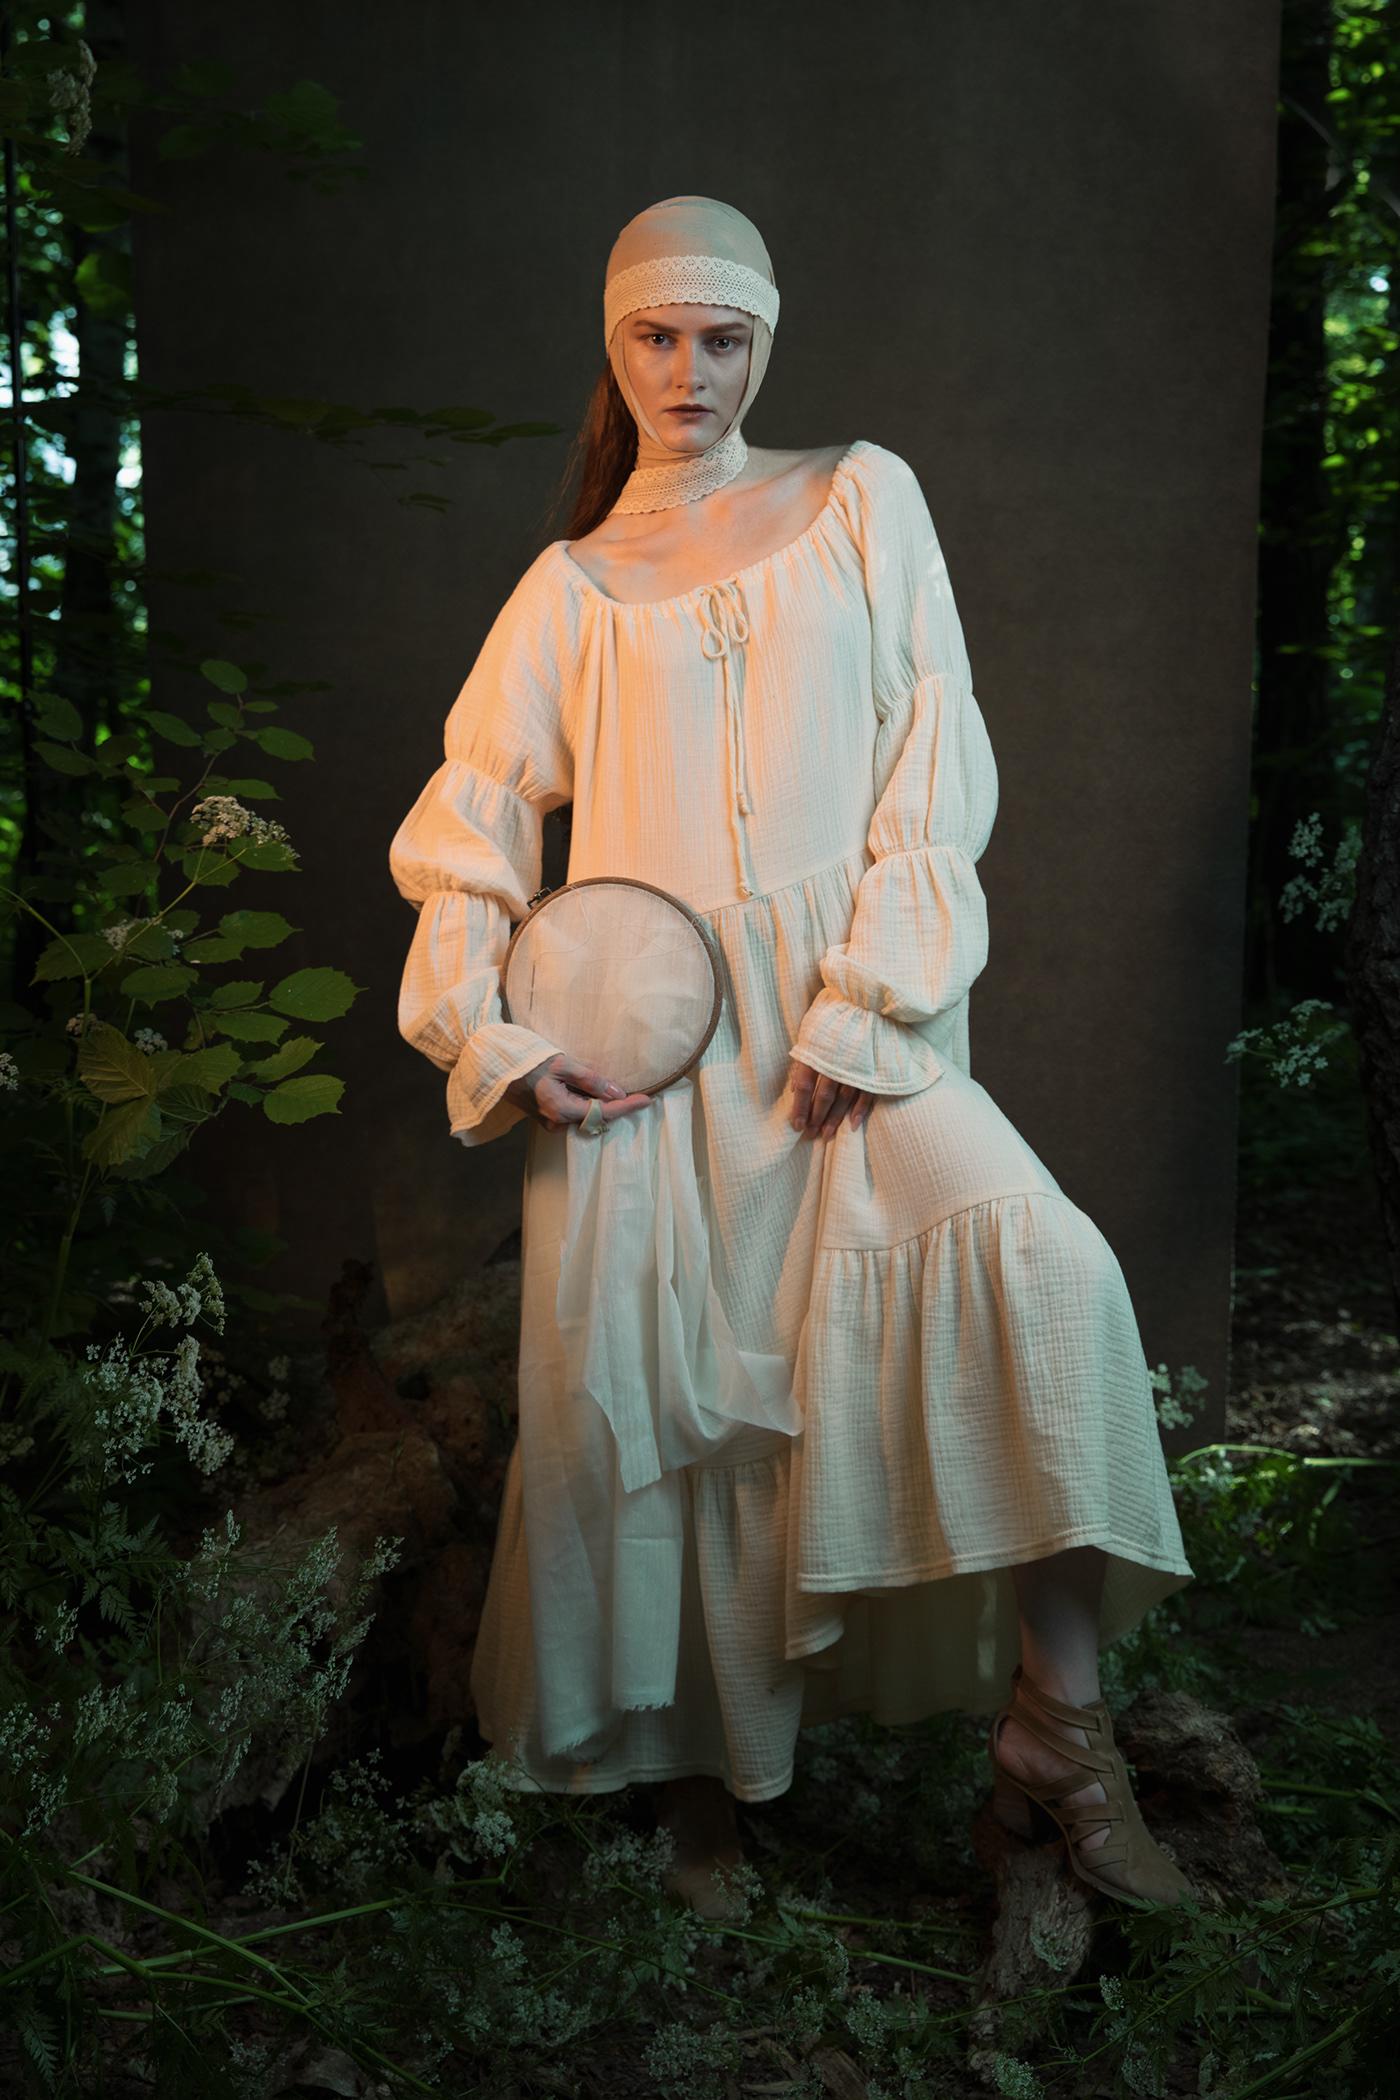 fairy fairy tale Folklore long hair Nature painting   peach portrait rose